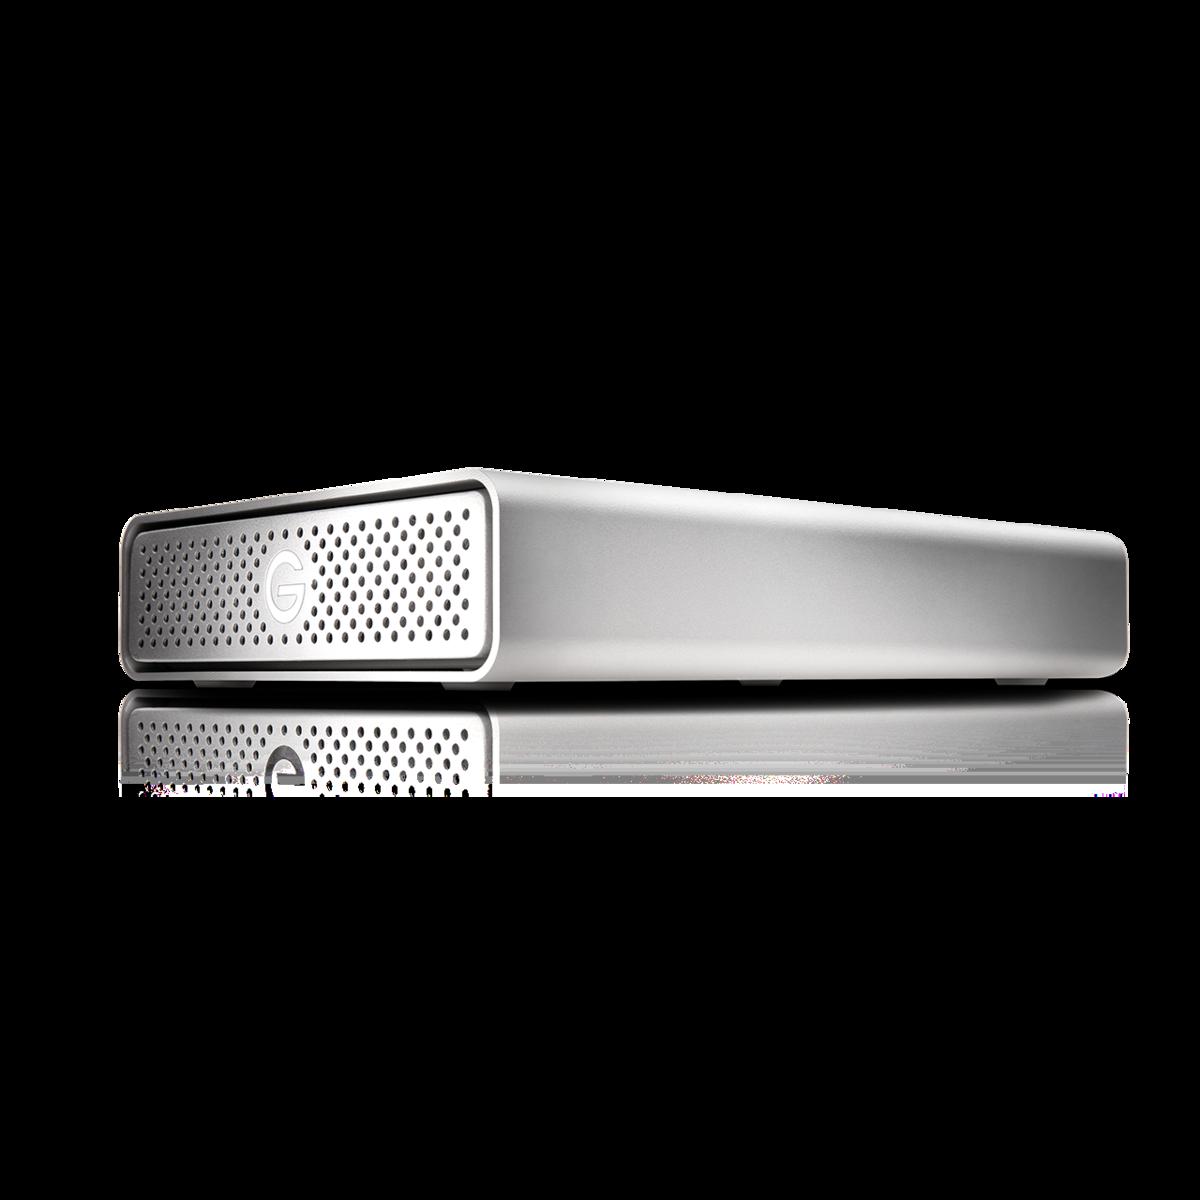 G-TECH - G-Technology G-Drive USB3.0 4TB(3 year warranty)